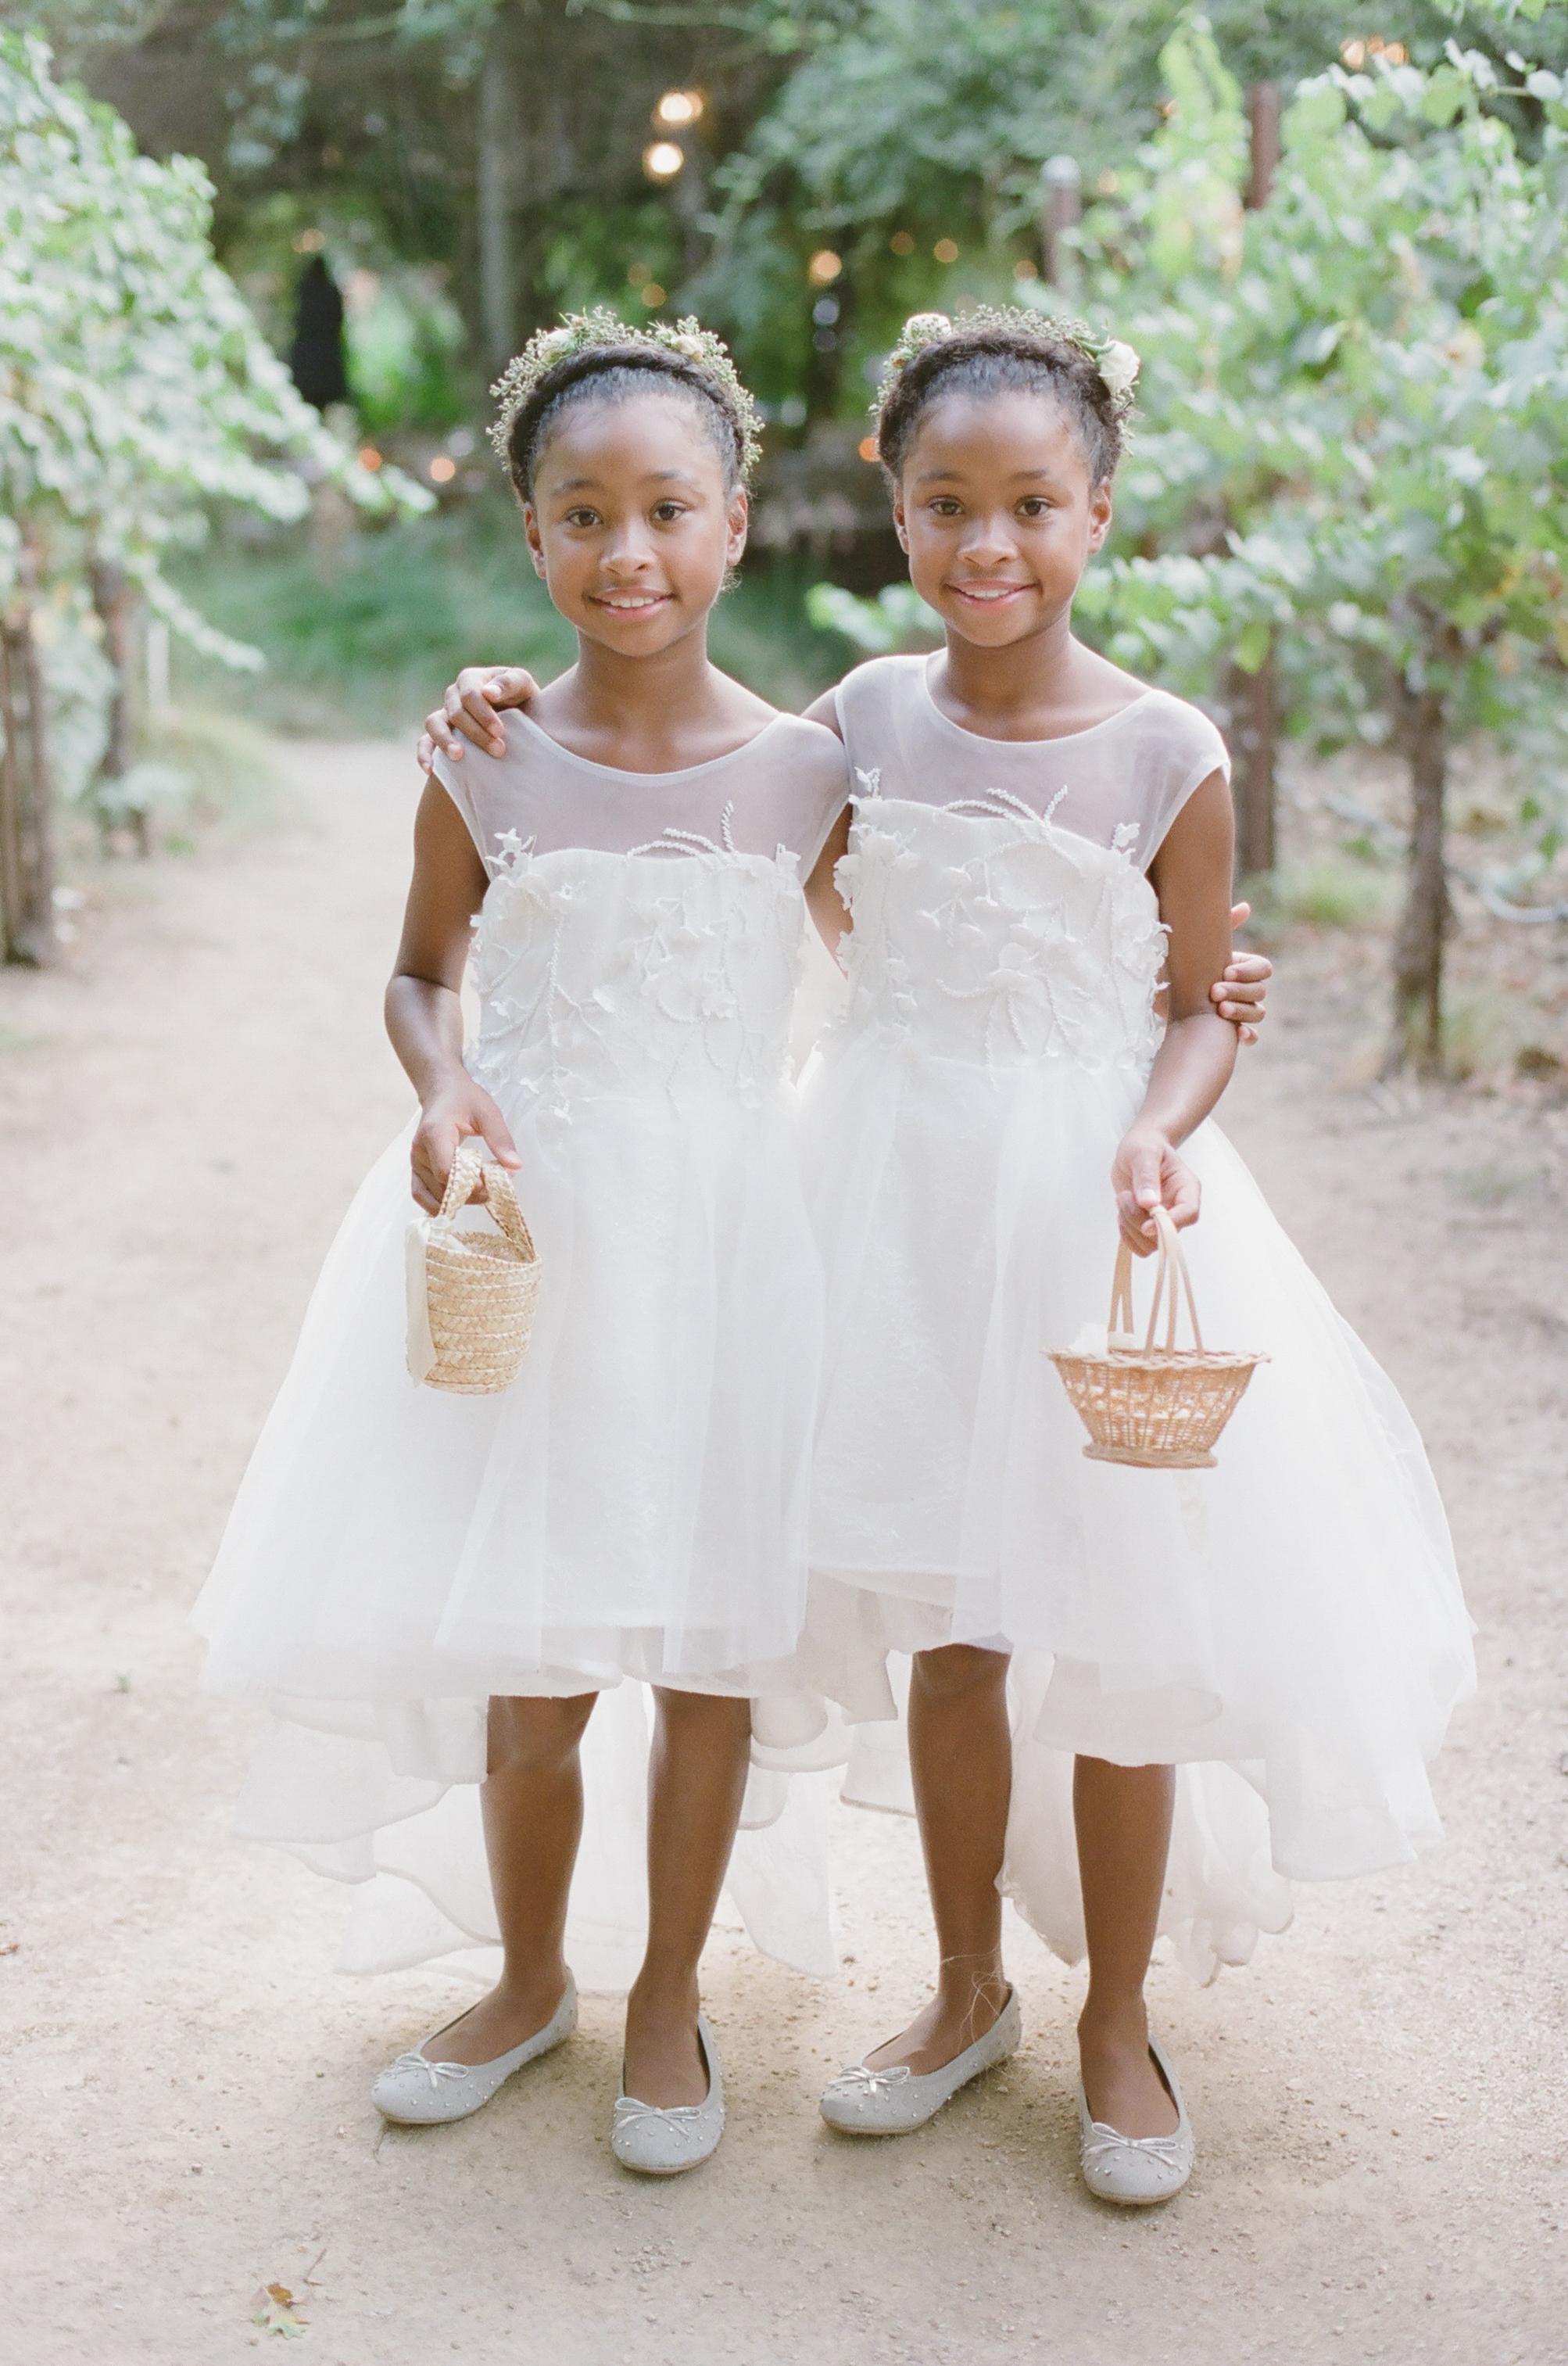 two flower girls holding small wicker baskets